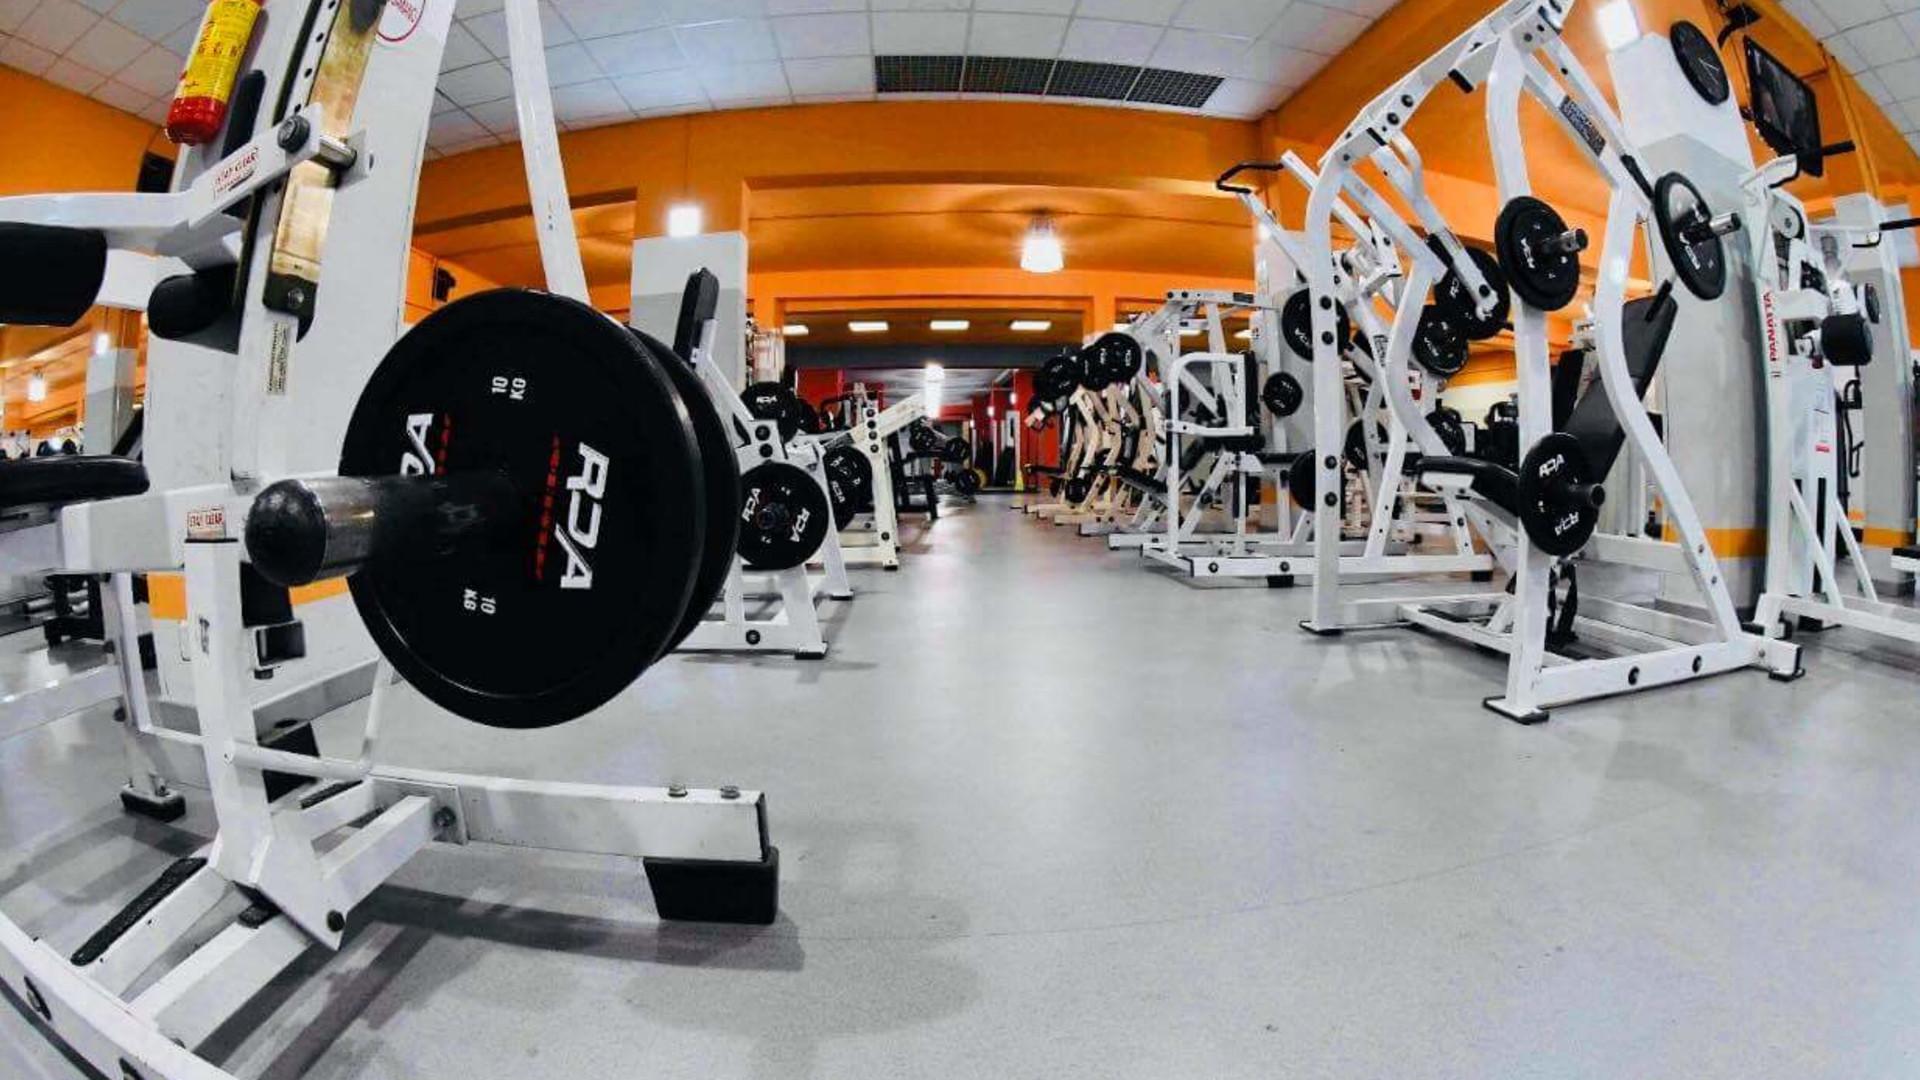 Tiger Fitness offerte